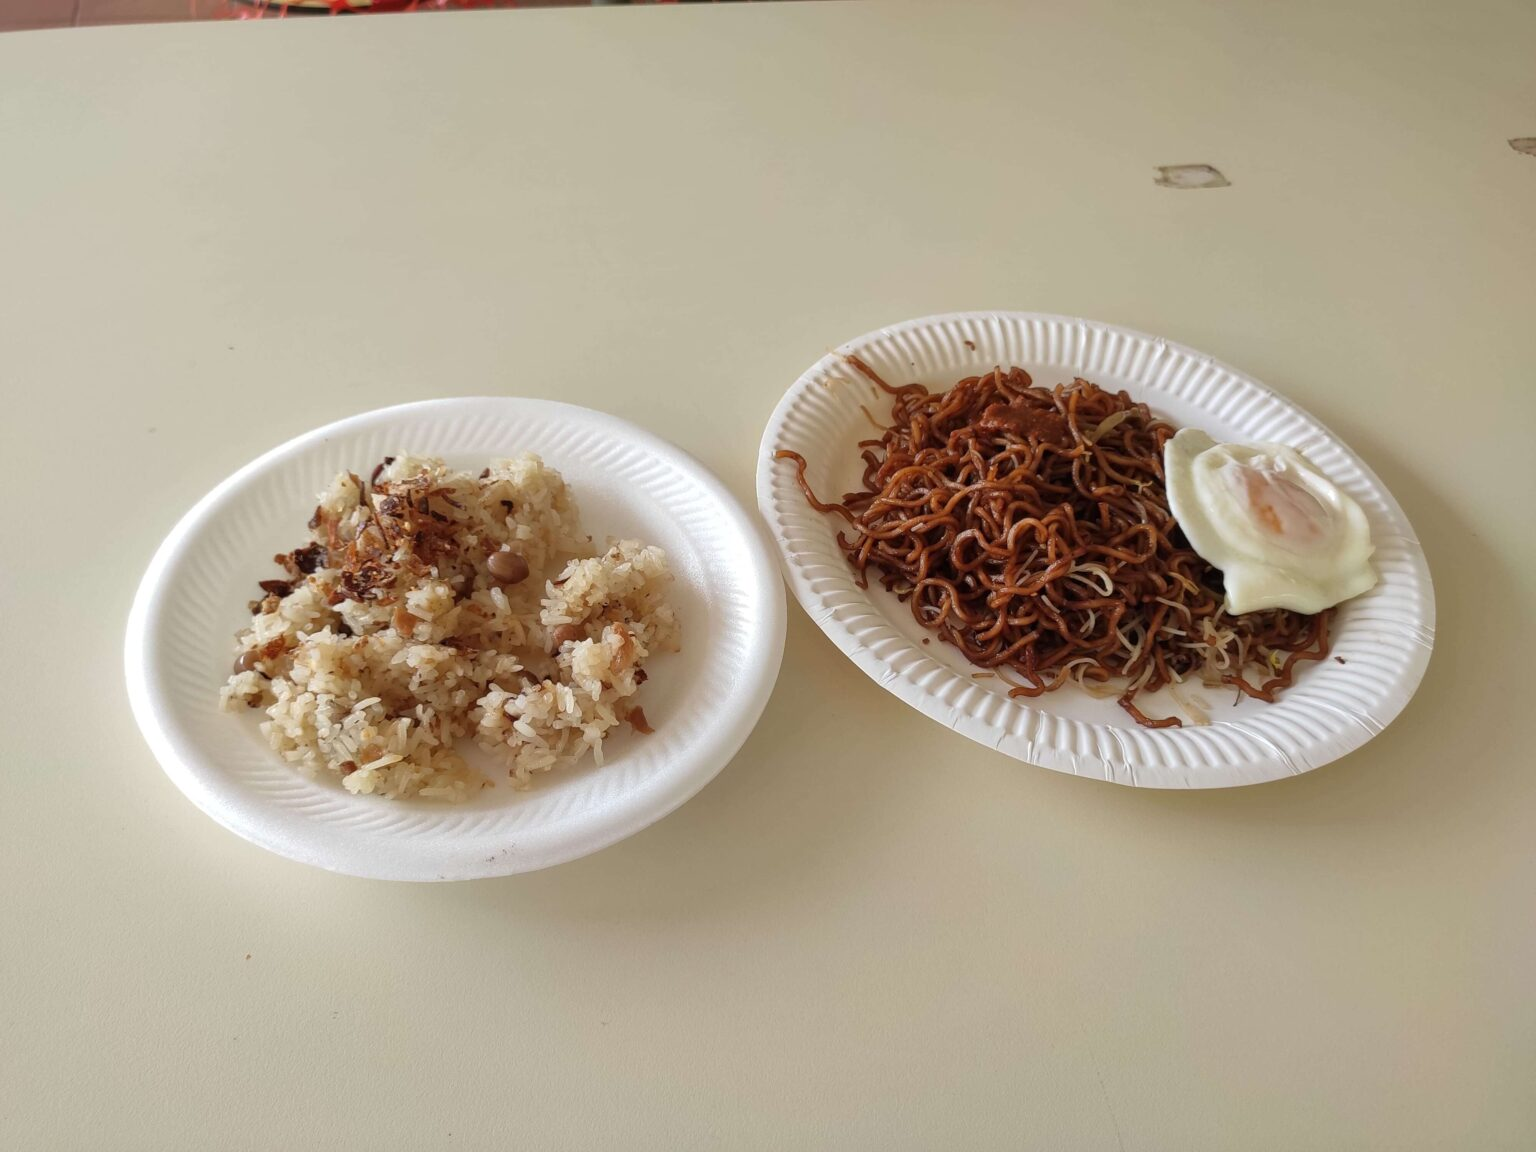 Review: Economic Food – Havelock Road Food Centre (Singapore)